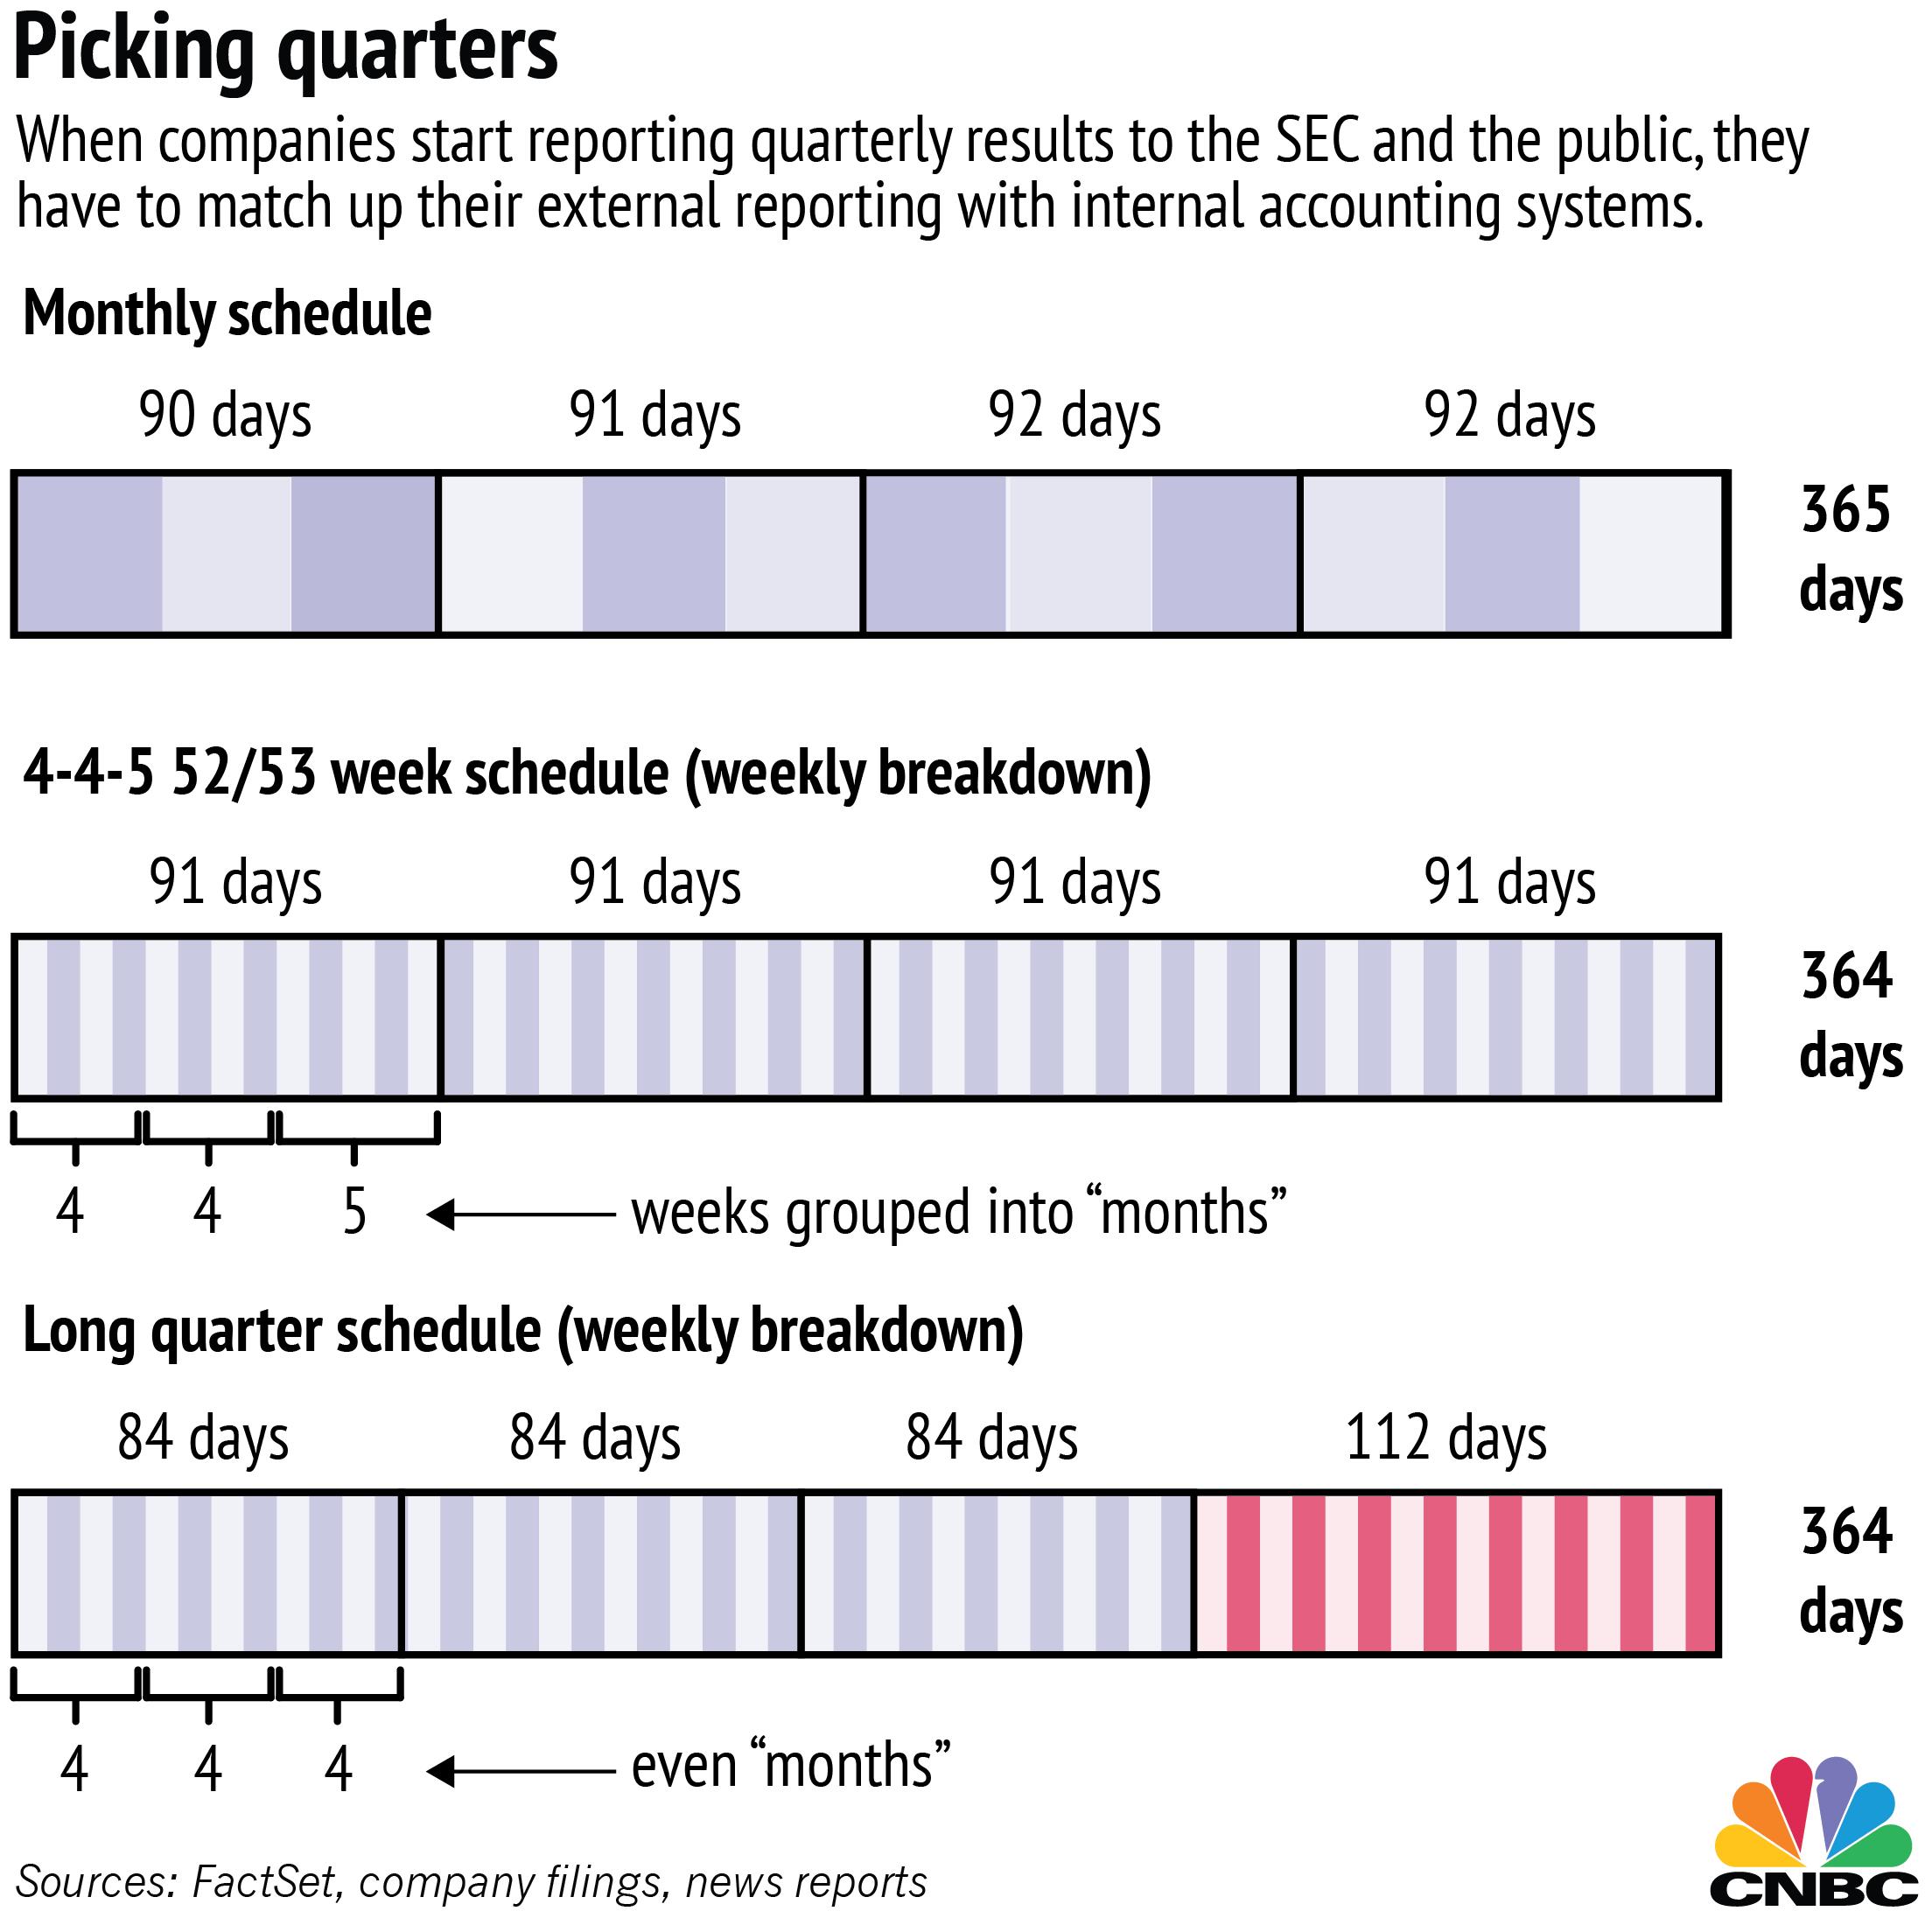 Supersized quarters: Some companies report quarterly info